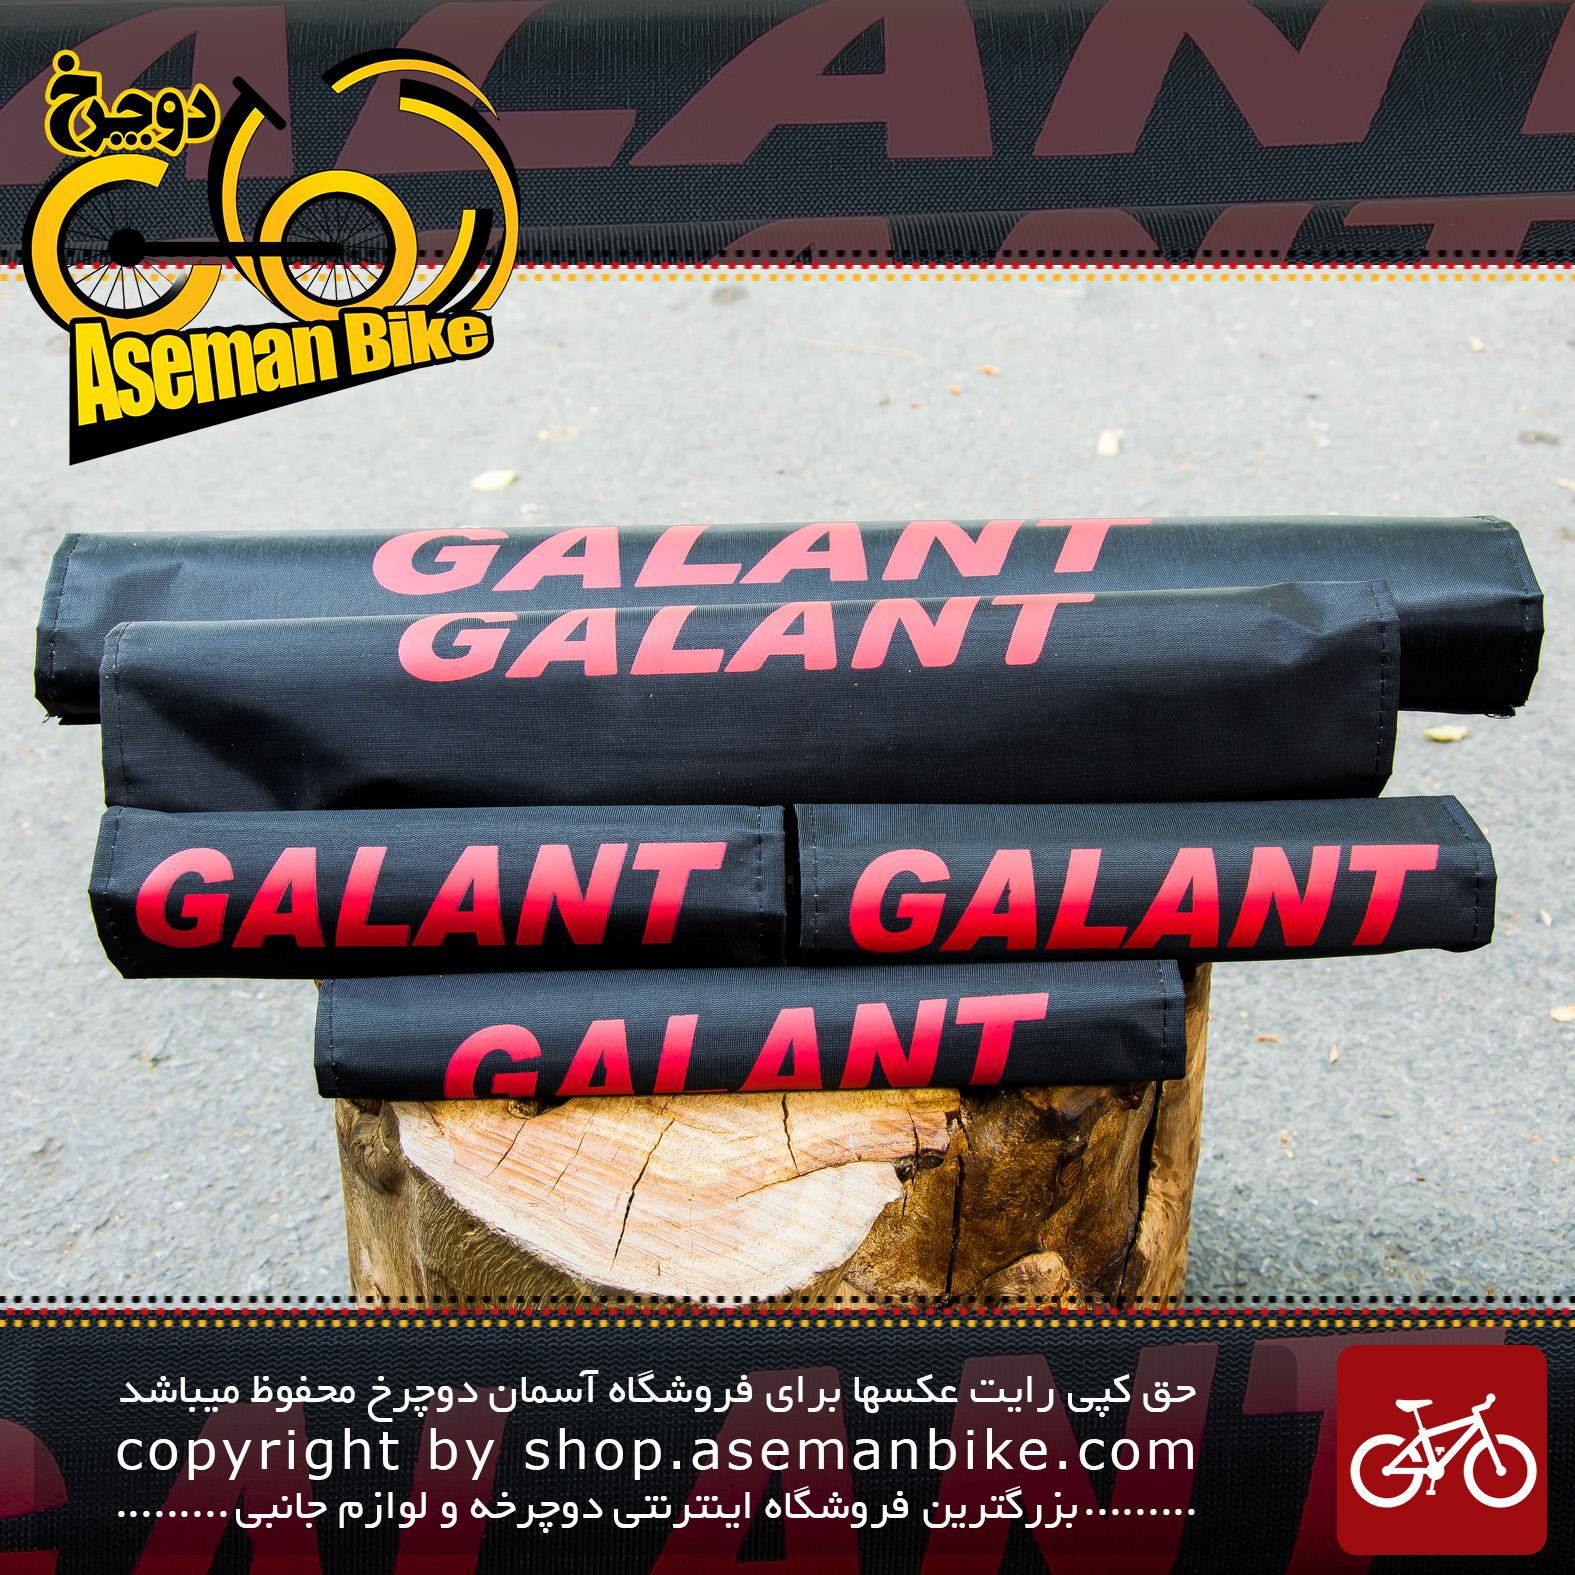 کاور بدنه دوچرخه 5 تیکه گالانت Cover Frame Bicycle 5 part Galant